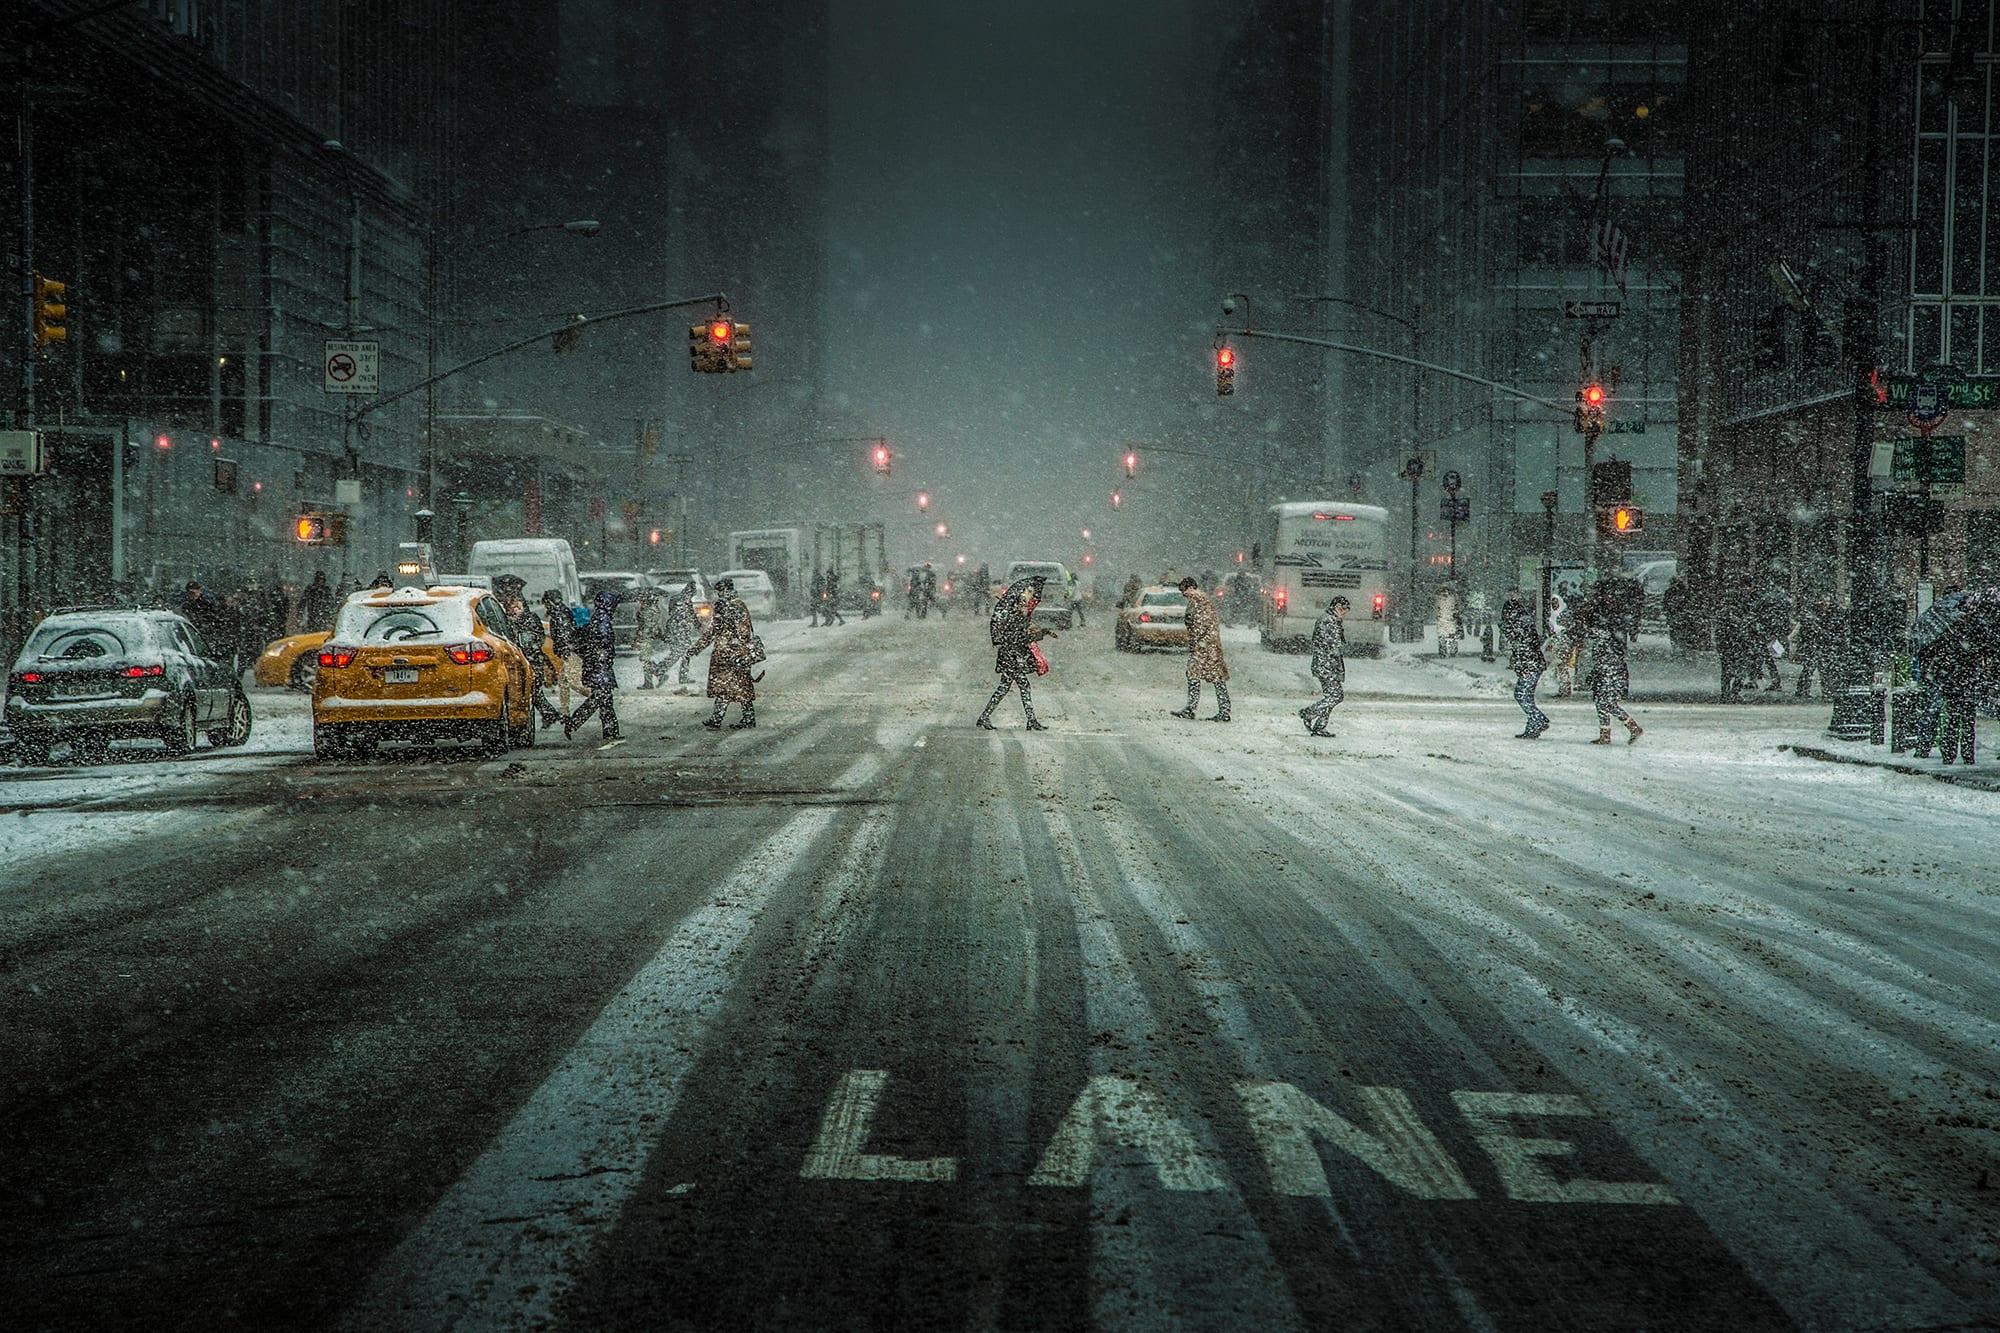 Digital Editing School at New York Film Academy